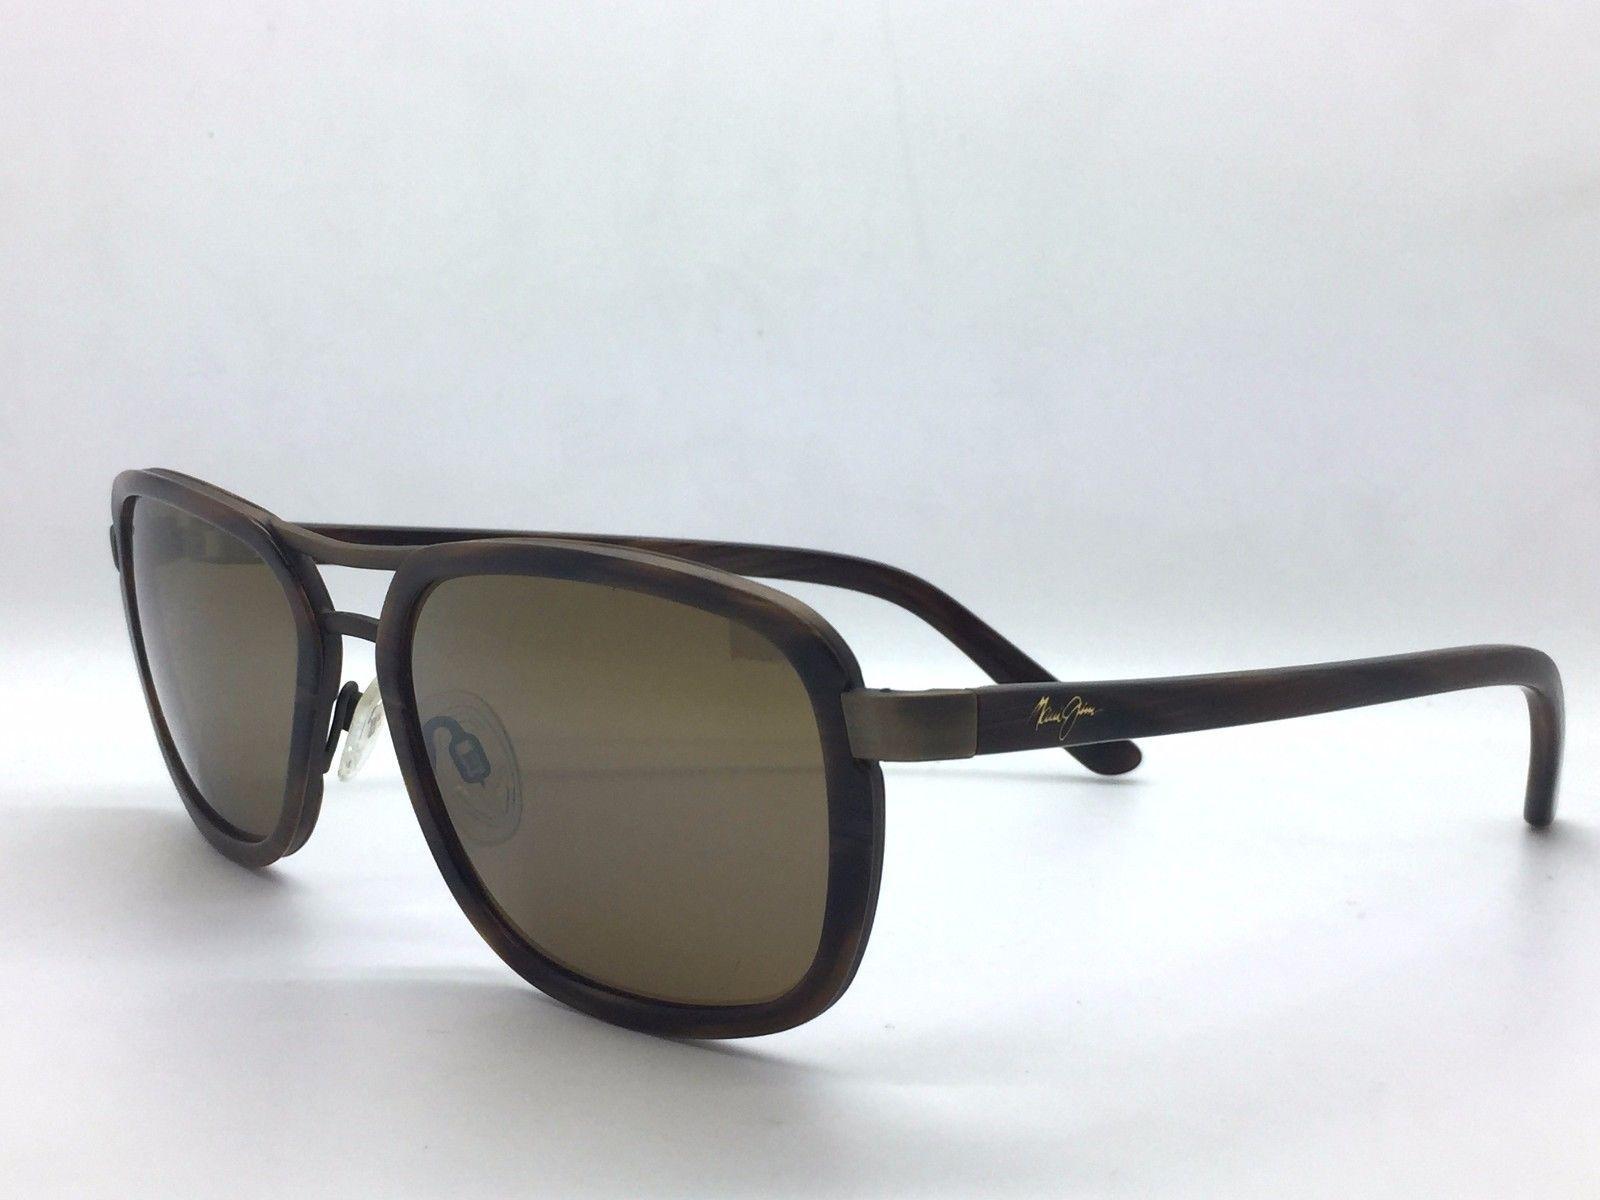 New Maui Jim Sunglasses Wanderer Matte Expresso HCL Bronze H289-19M